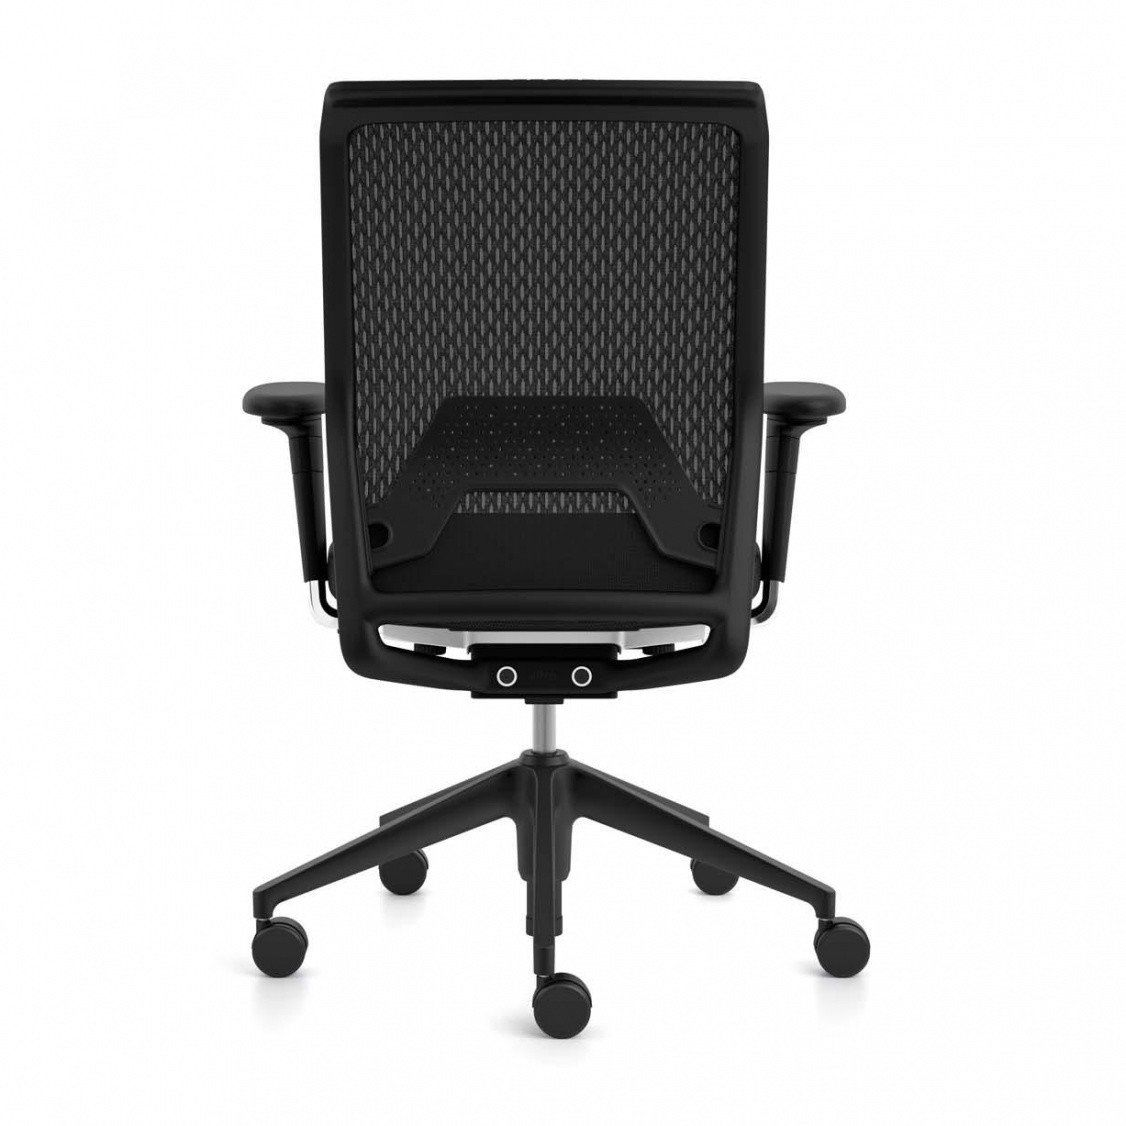 Vitra id mesh chaise de bureau pivotante vitra for Chaise de bureau vitra prix